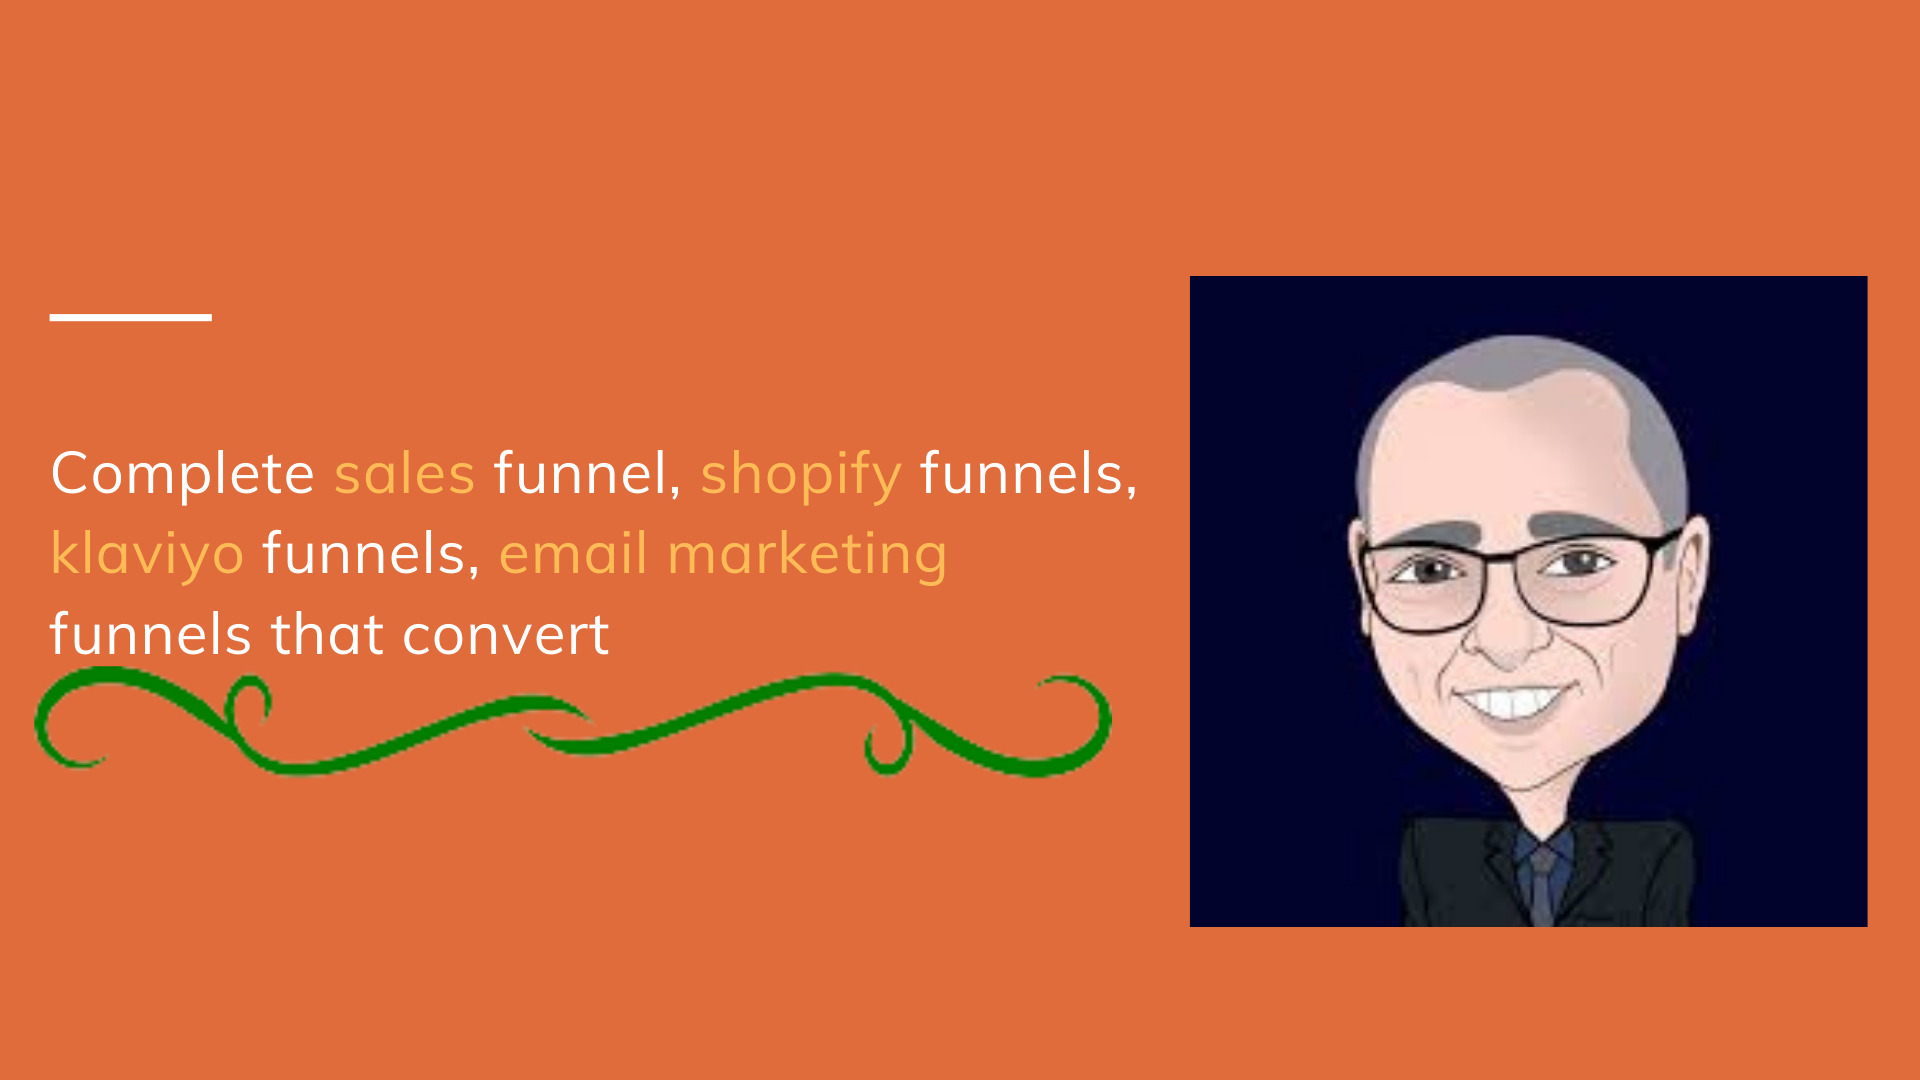 I will shopify sales funnel klaviyo sales funnel groovefunnel sales funnel that, FiverrBox